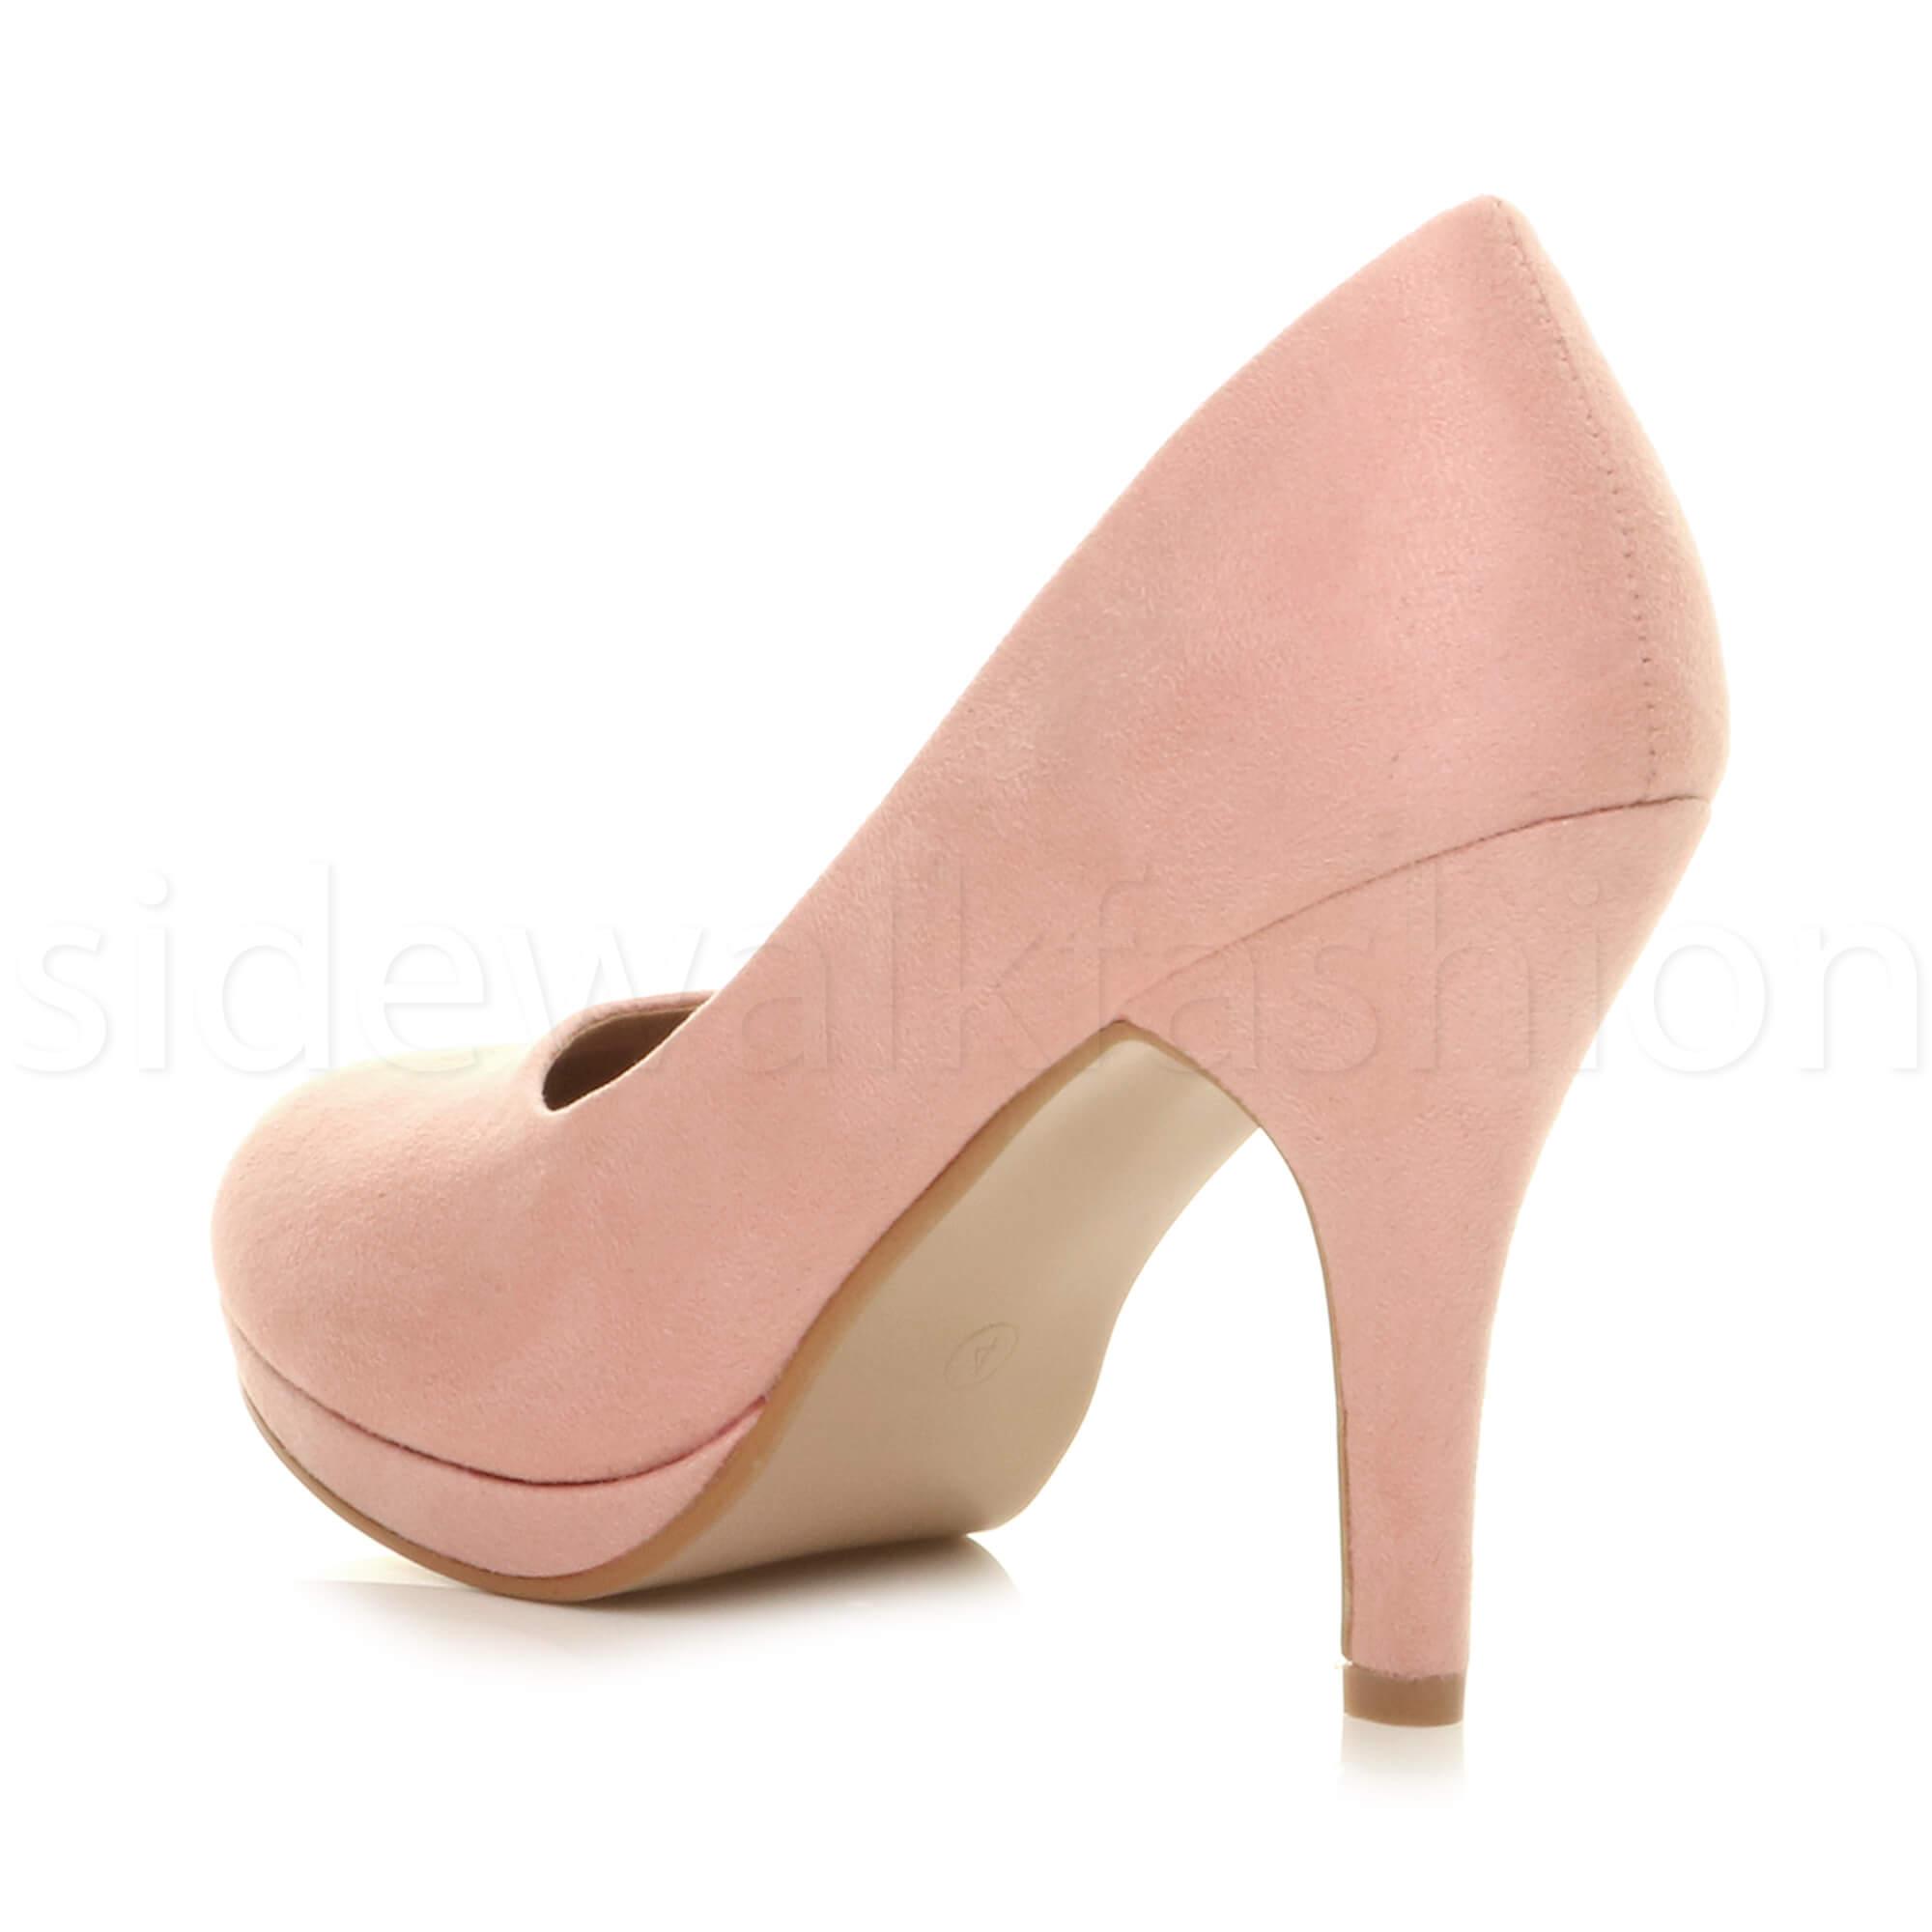 Womens-ladies-high-mid-heel-platform-wedding-evening-bridesmaid-court-shoes-size thumbnail 5